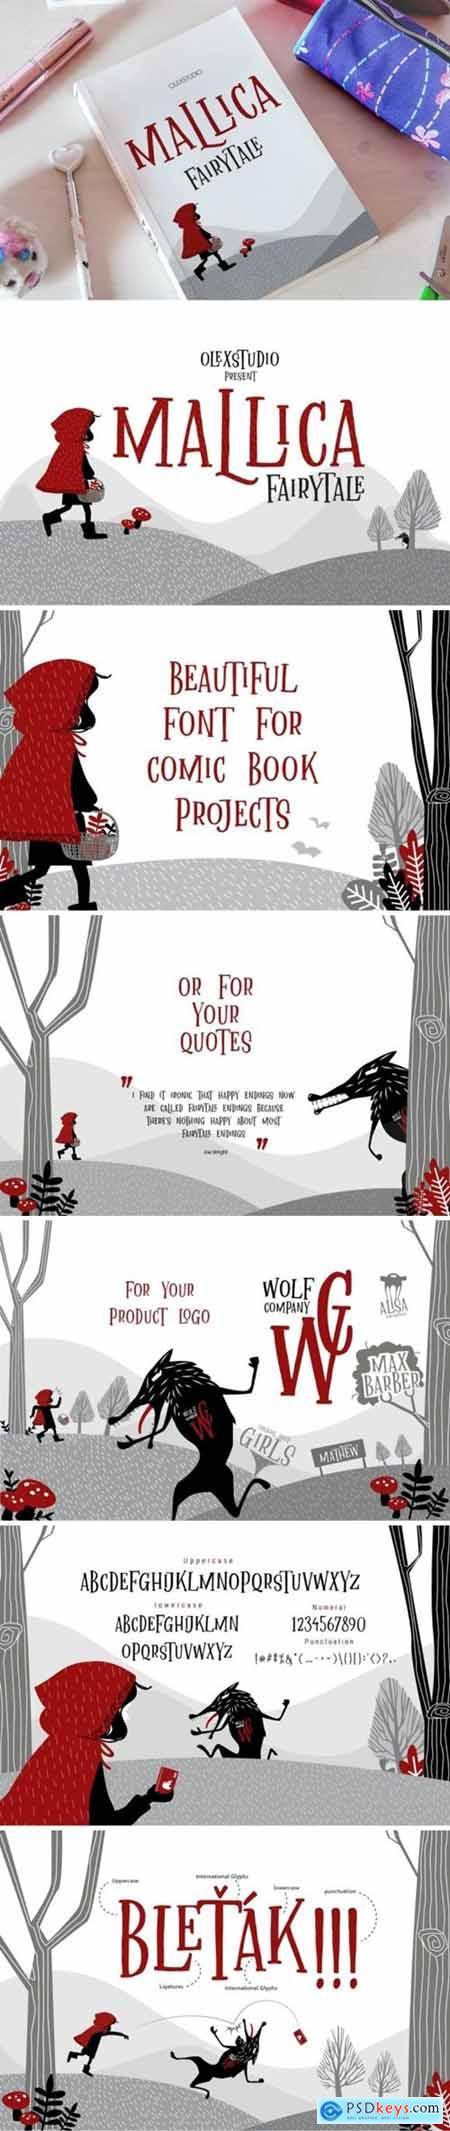 Malica Fairytale Font